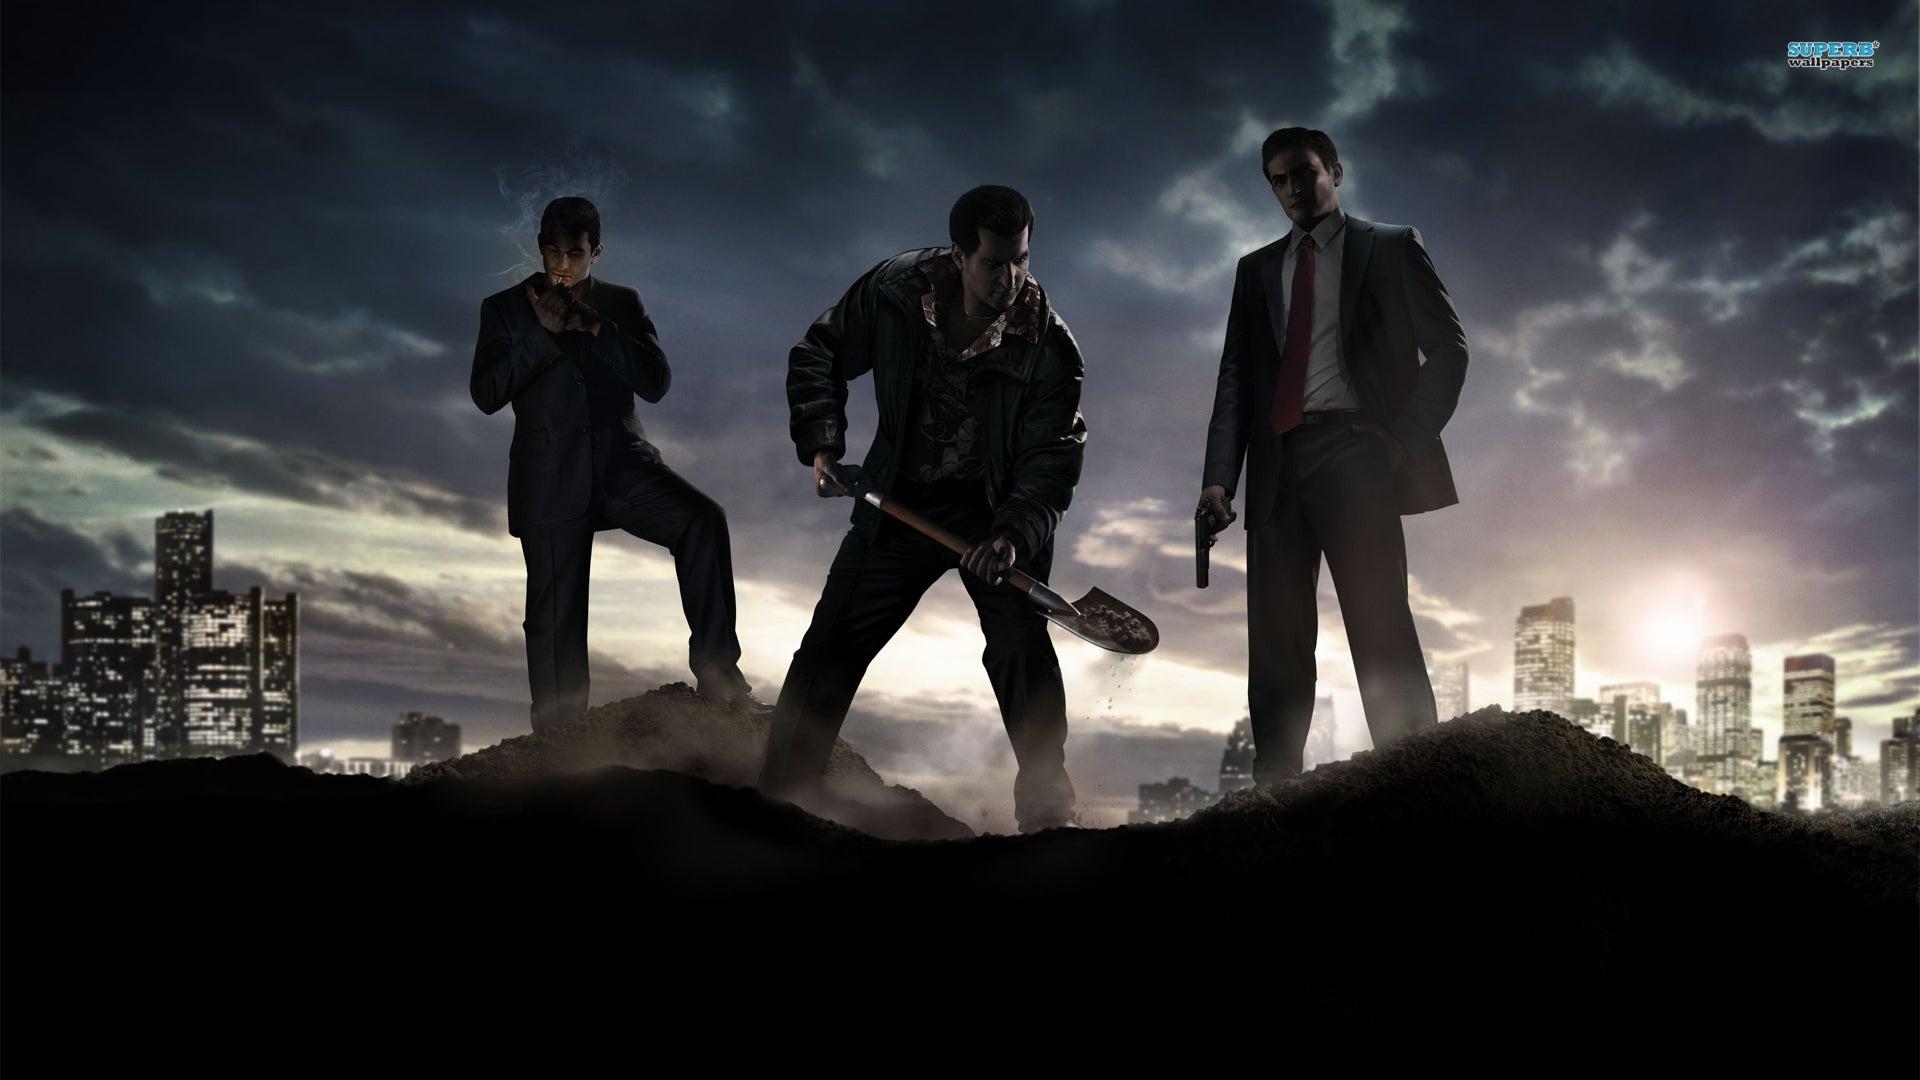 Image for Mafia: Trilogy gets a short and sweet teaser trailer